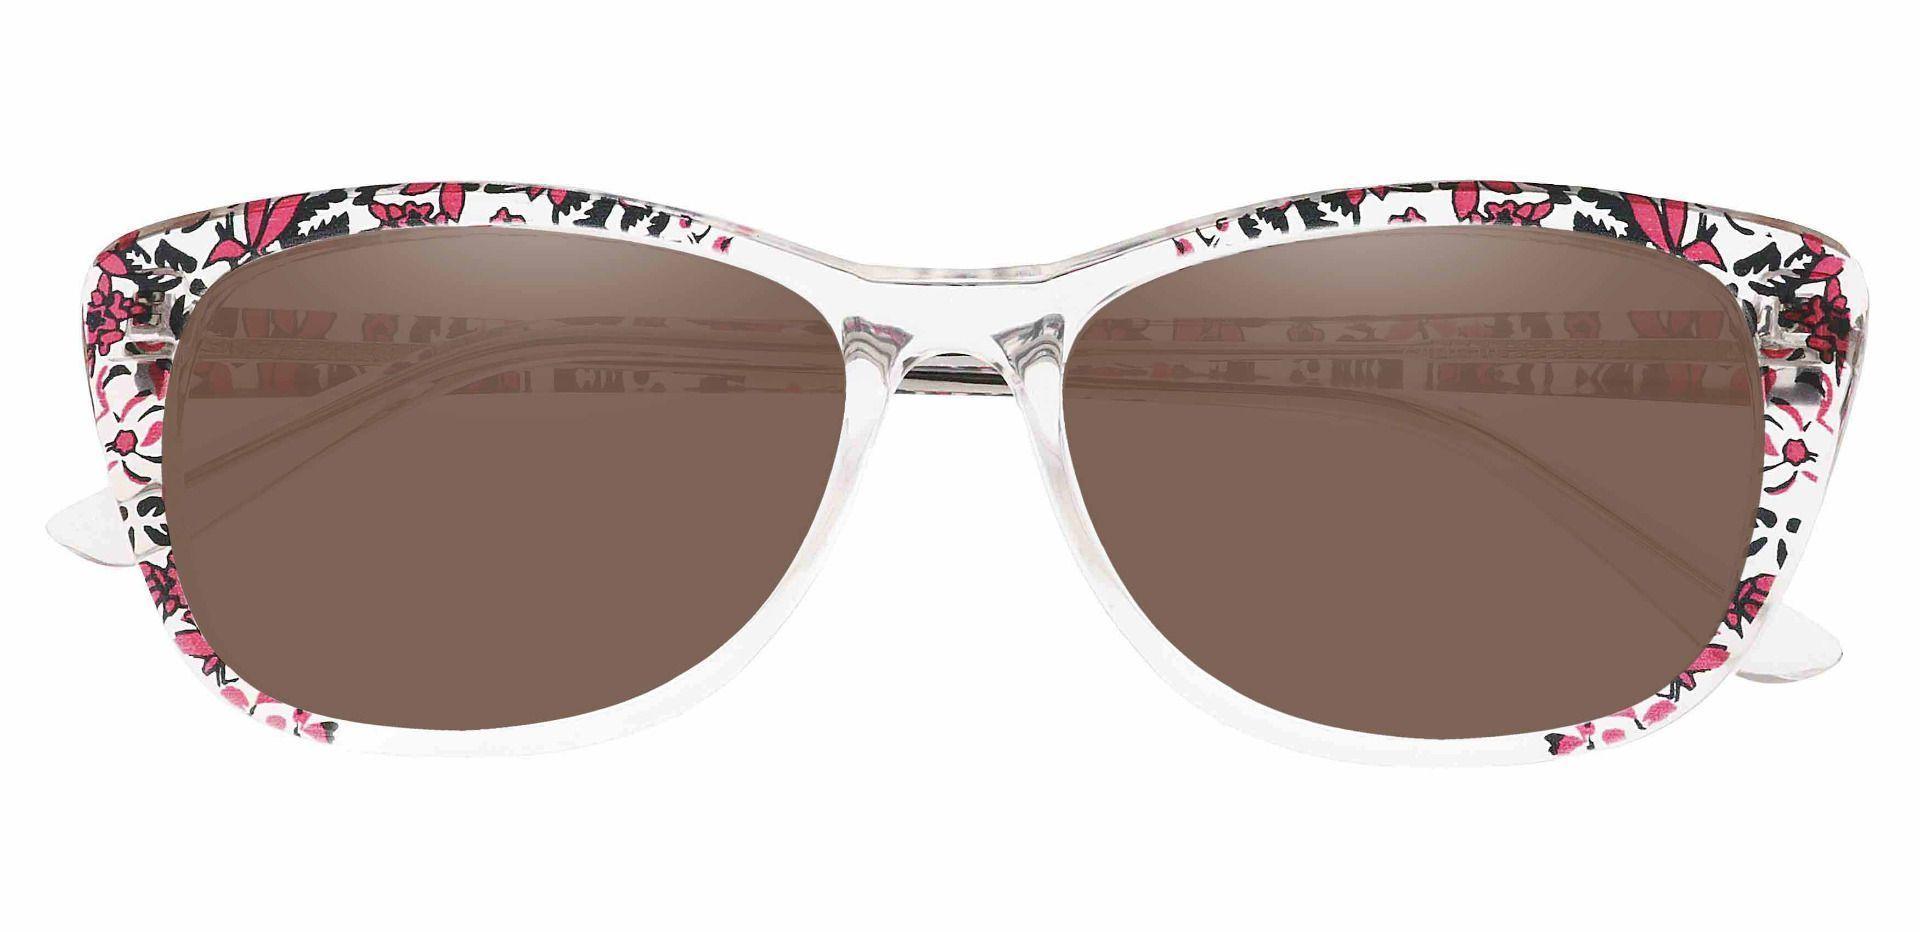 Simone Cat-Eye Prescription Sunglasses - Clear Frame With Brown Lenses